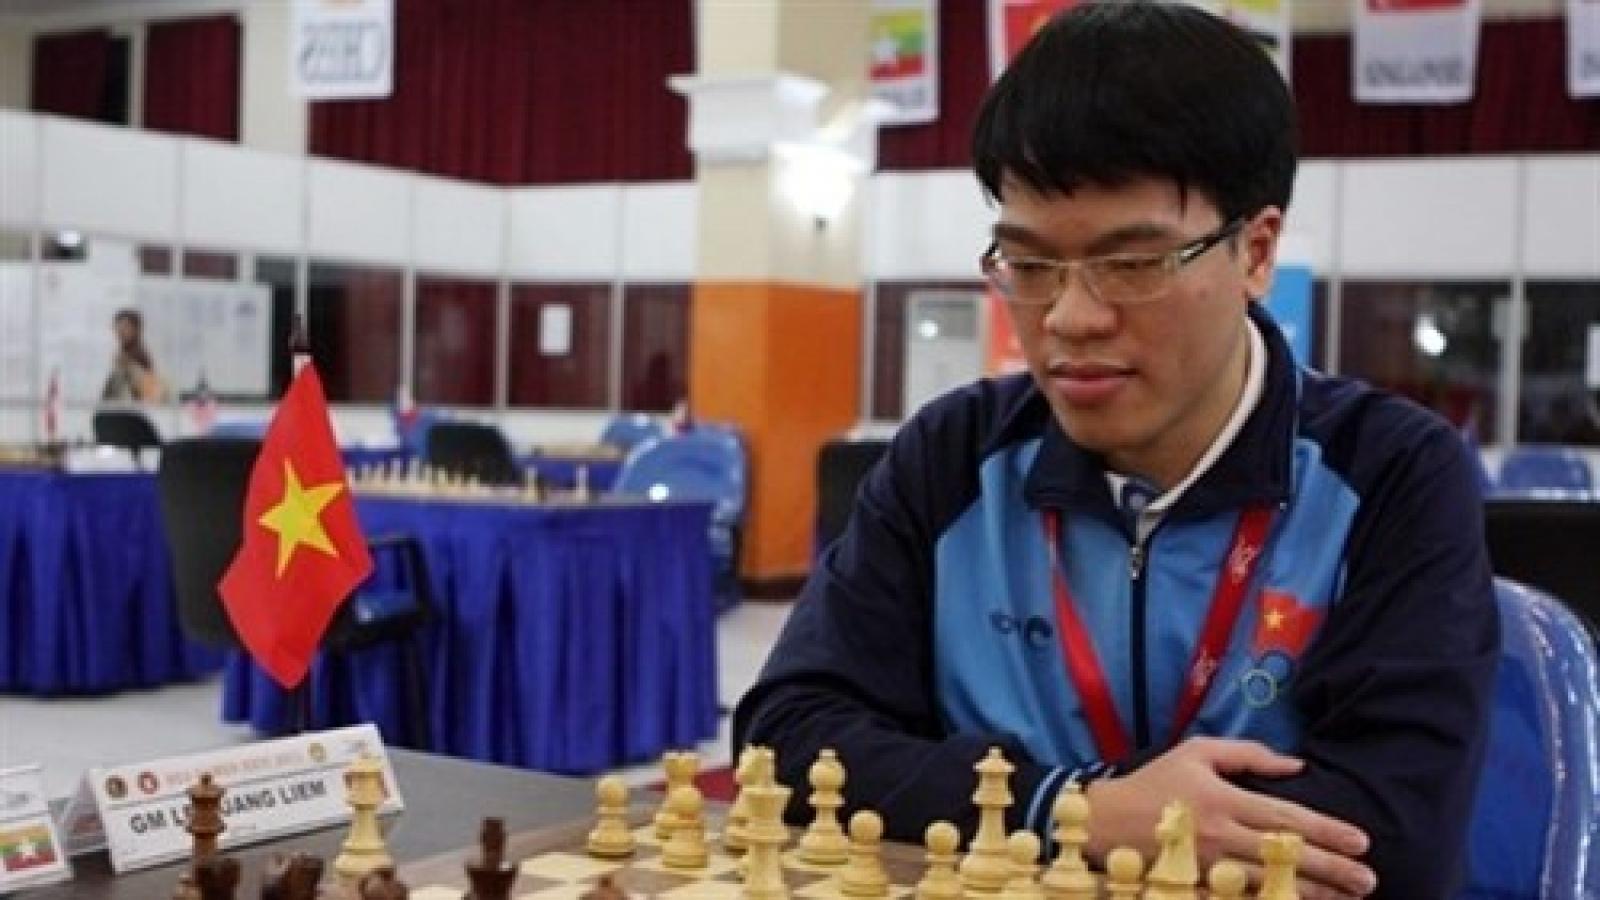 Liem ranks 2nd at Asian chess championship